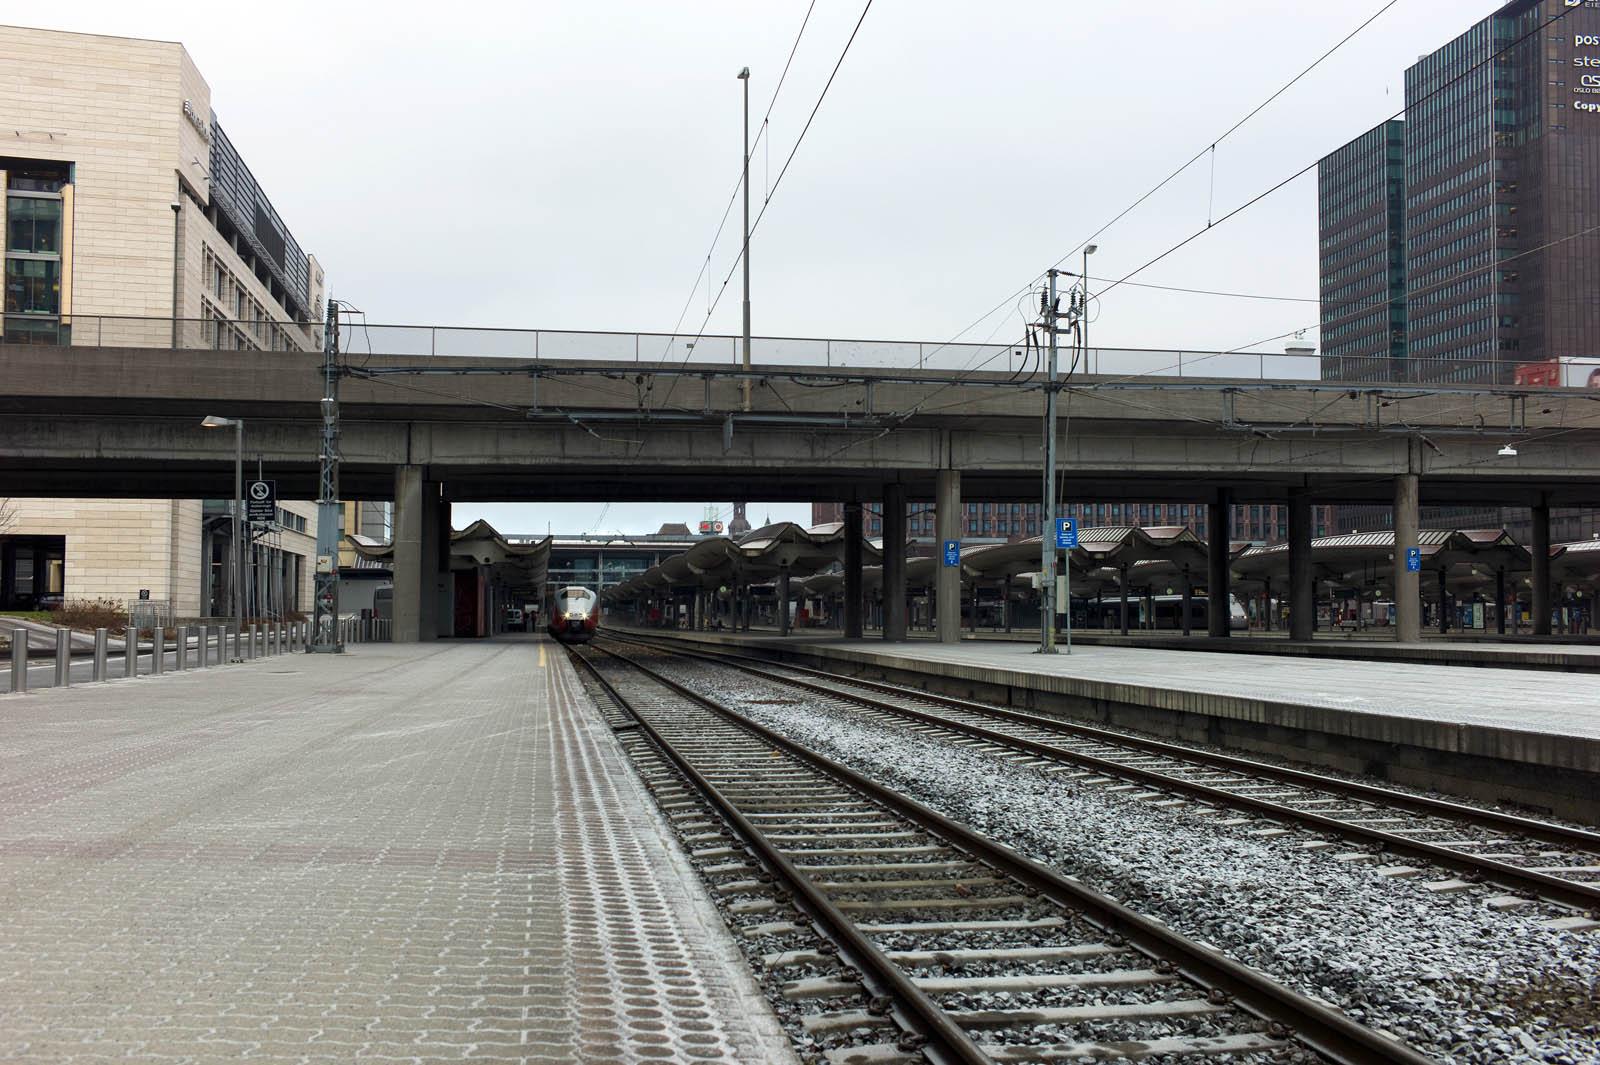 Østbanen